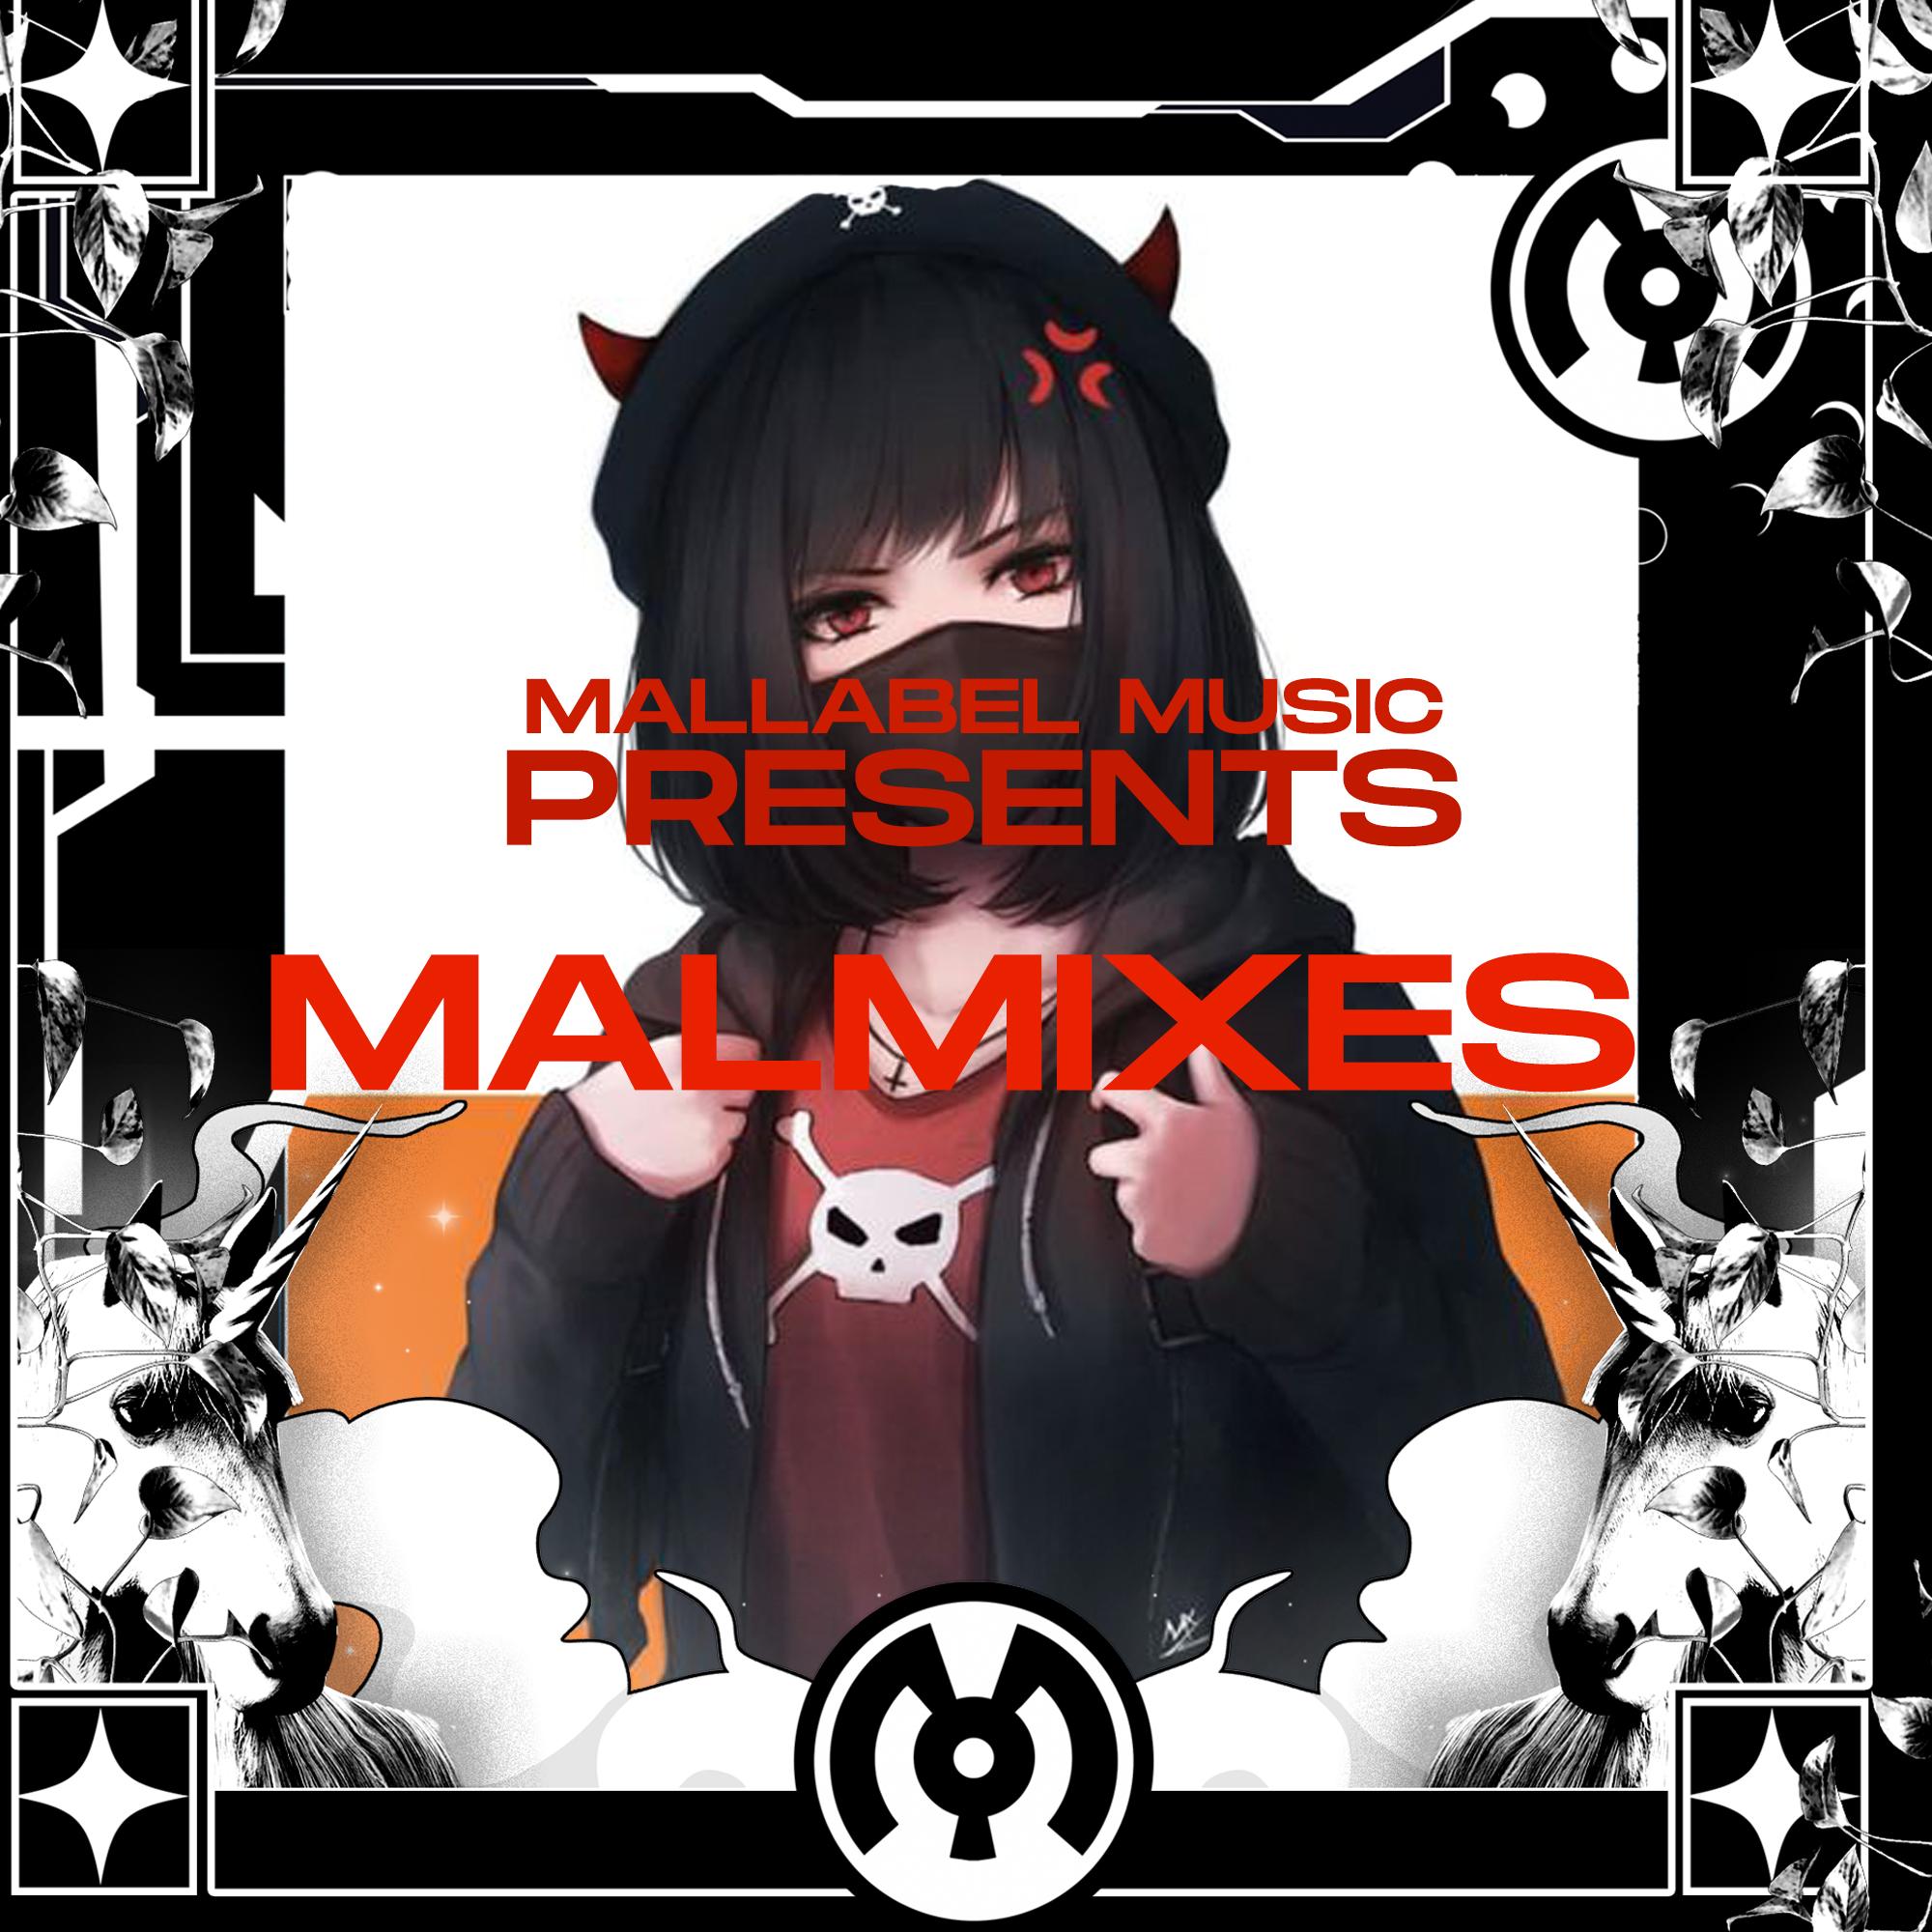 MalLabel Presents: MalMix